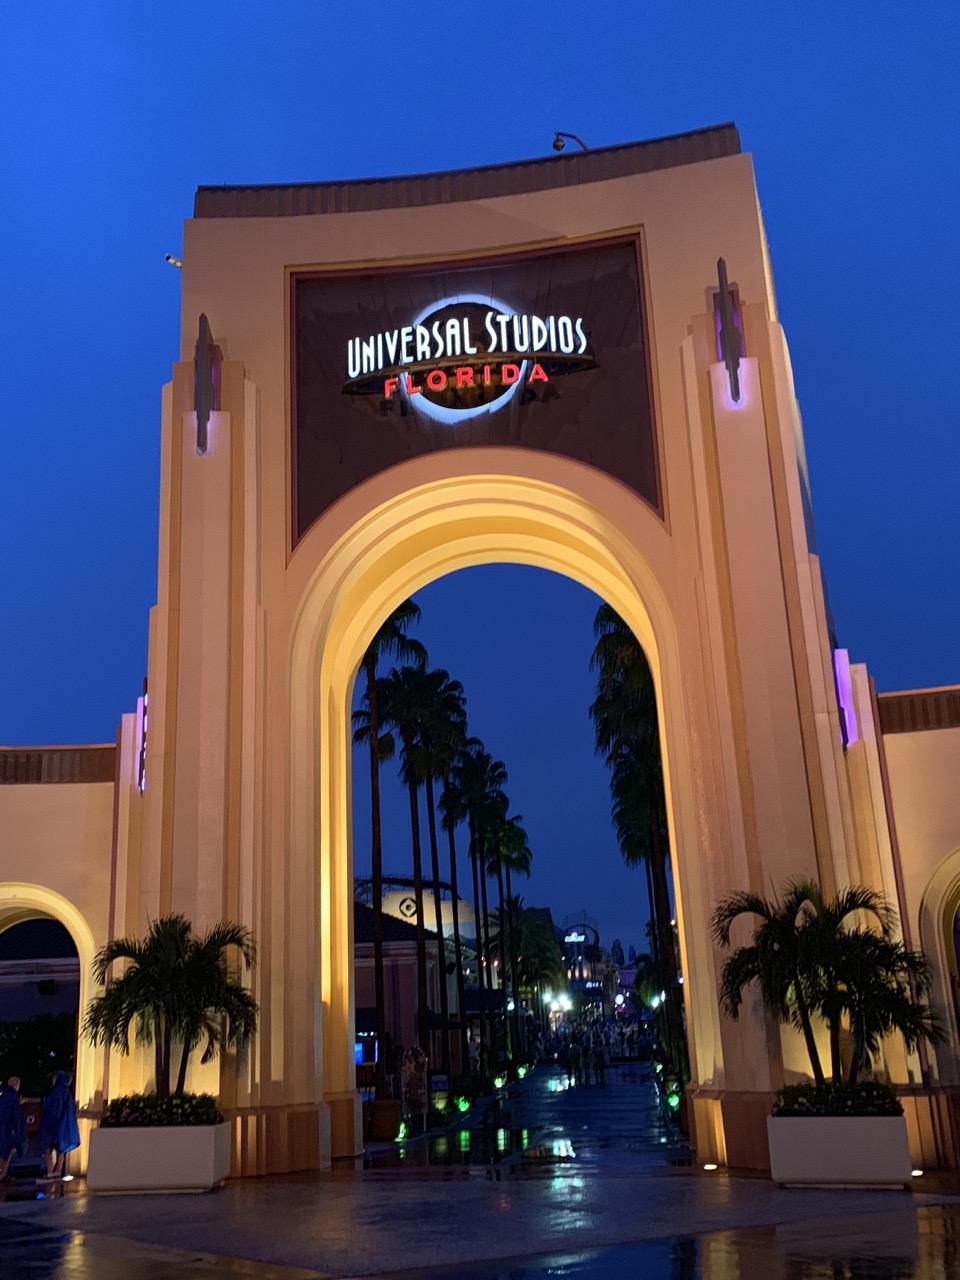 universal studios florida one day plan itinerary 14 night.jpeg